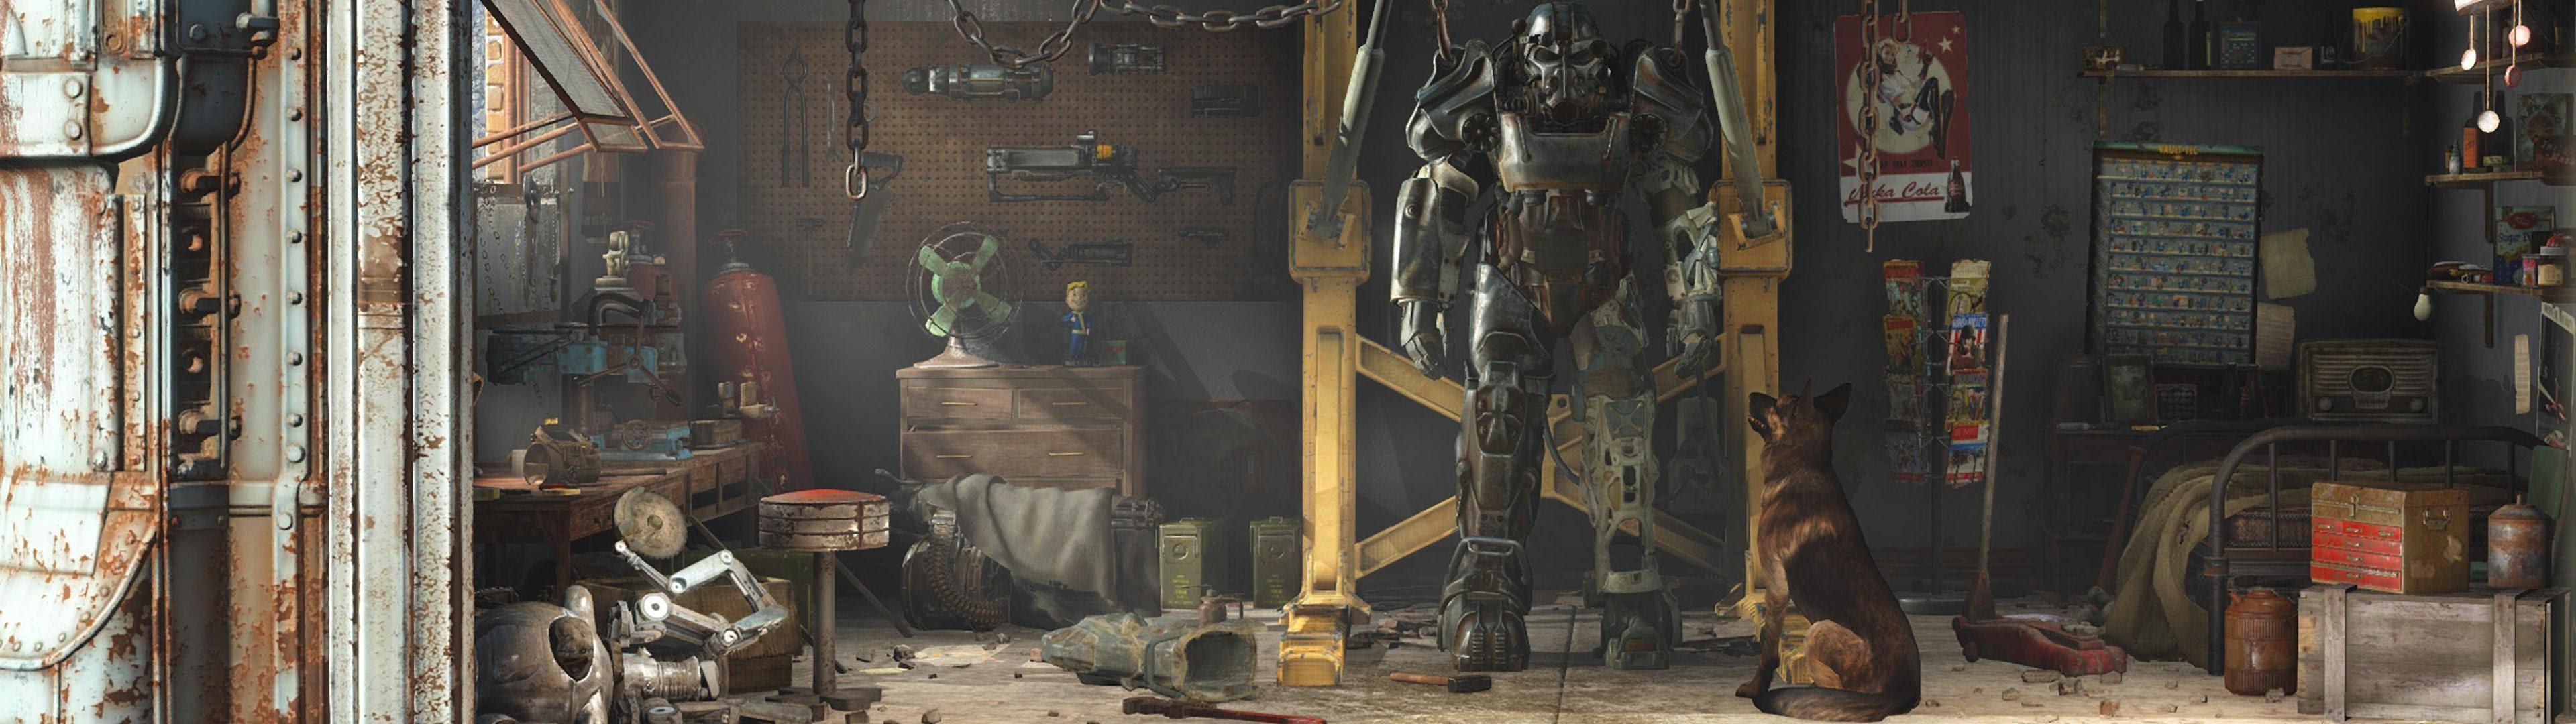 Dual Monitor Wallpaper Fallout 4 Andrea Gonz